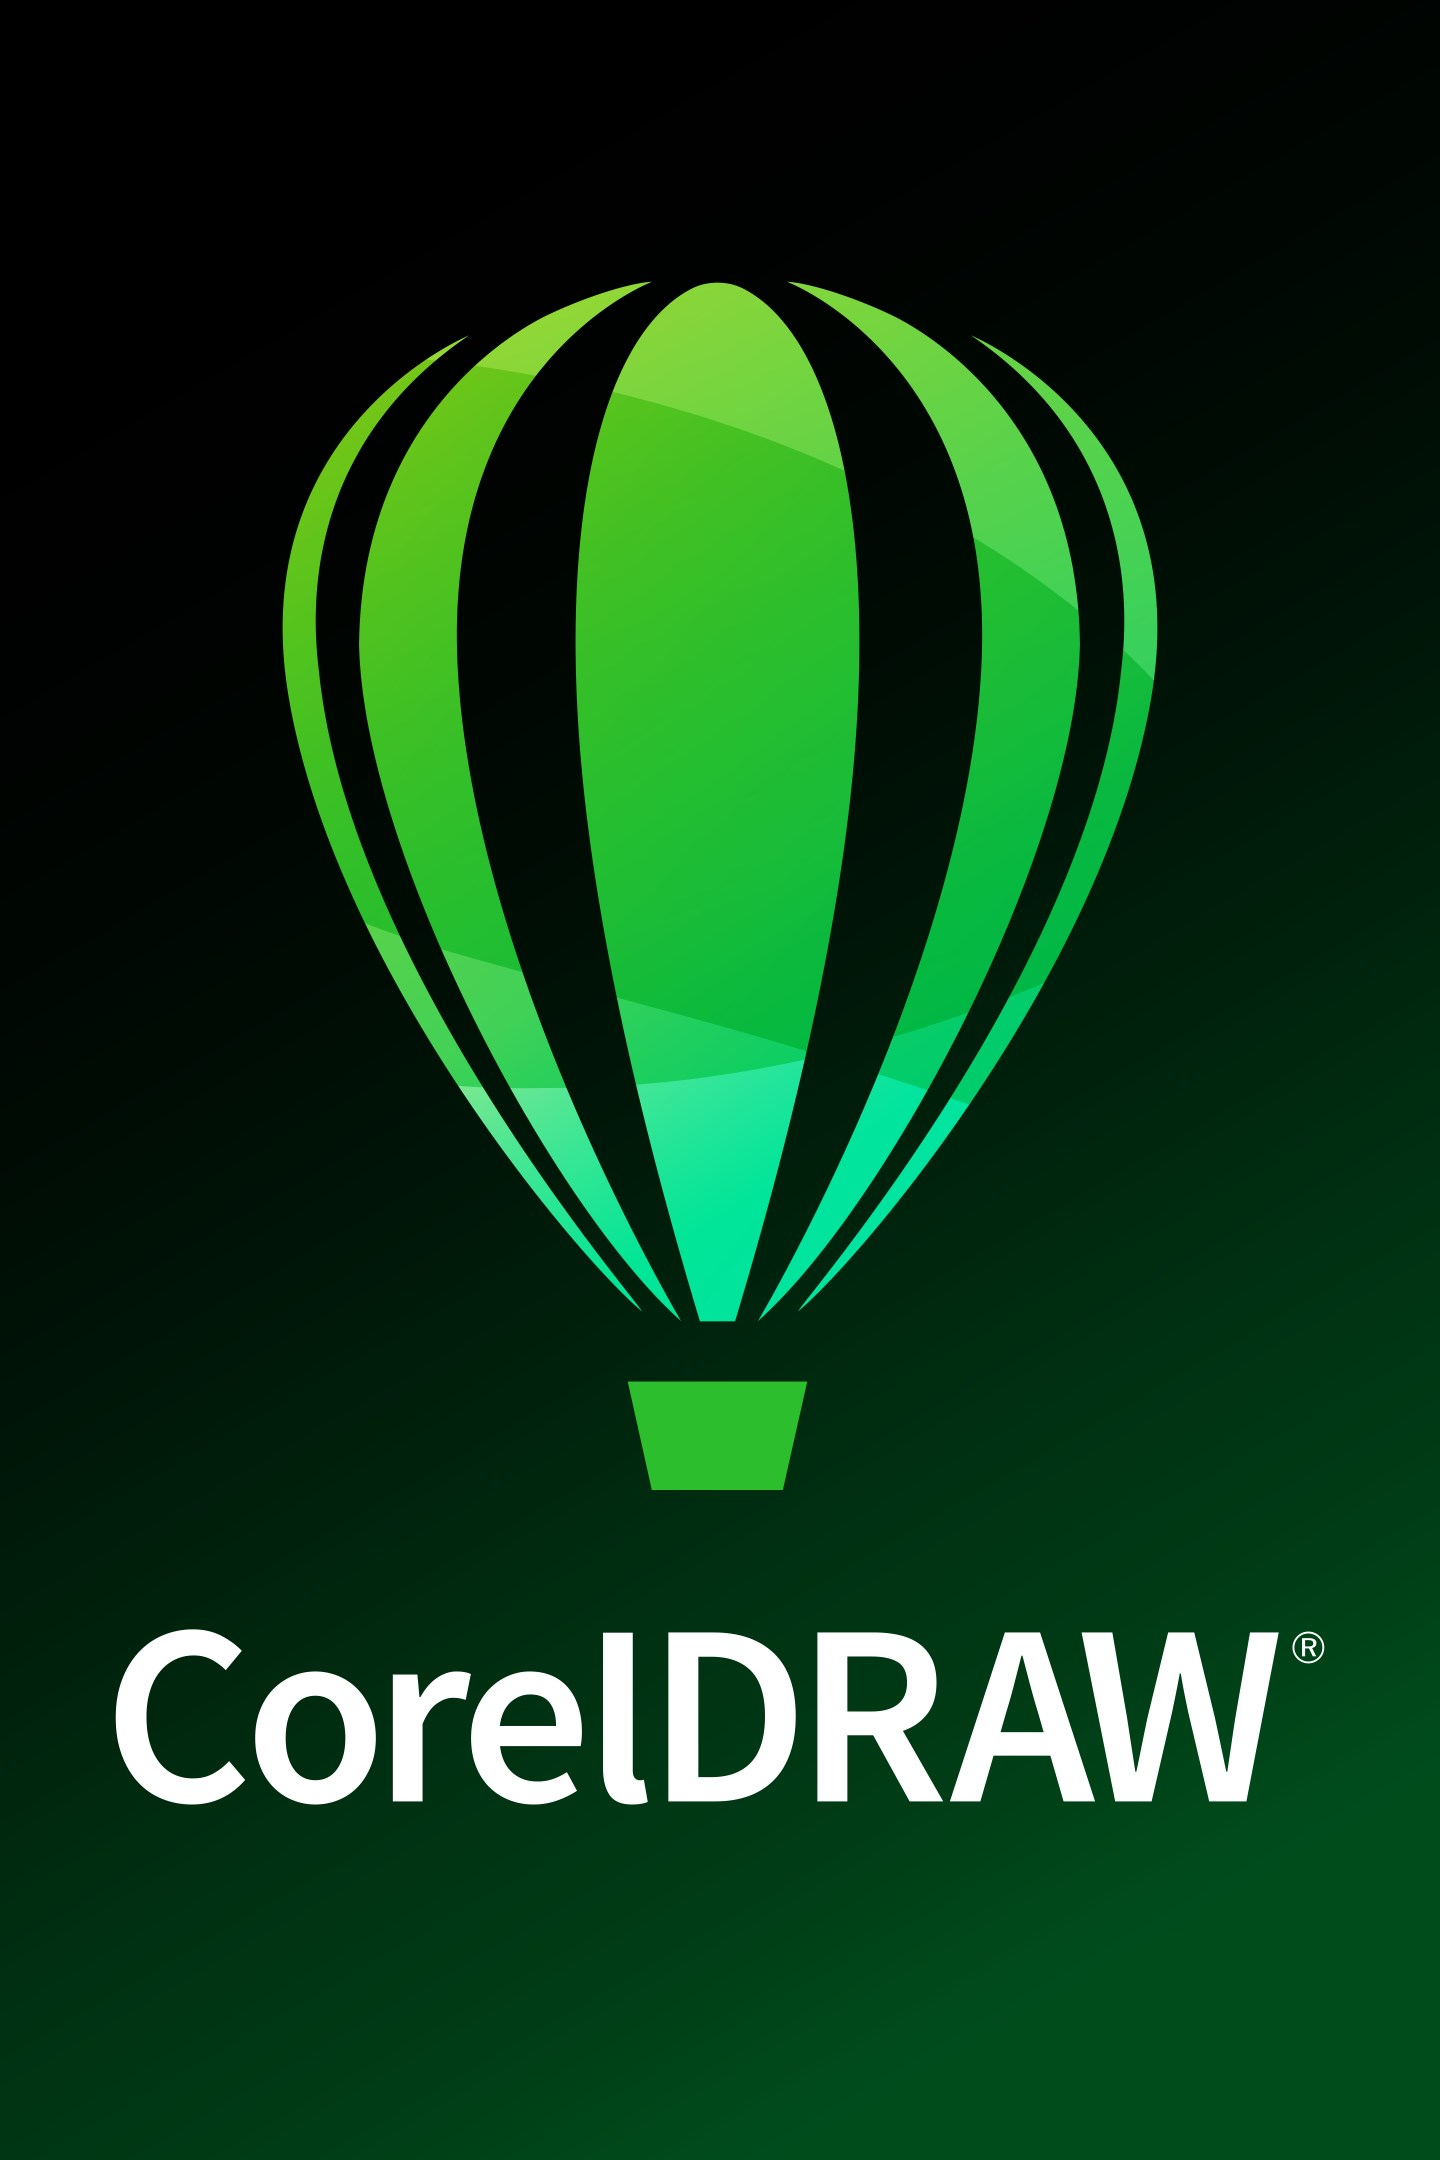 Get Coreldraw Microsoft Store Edition Microsoft Store